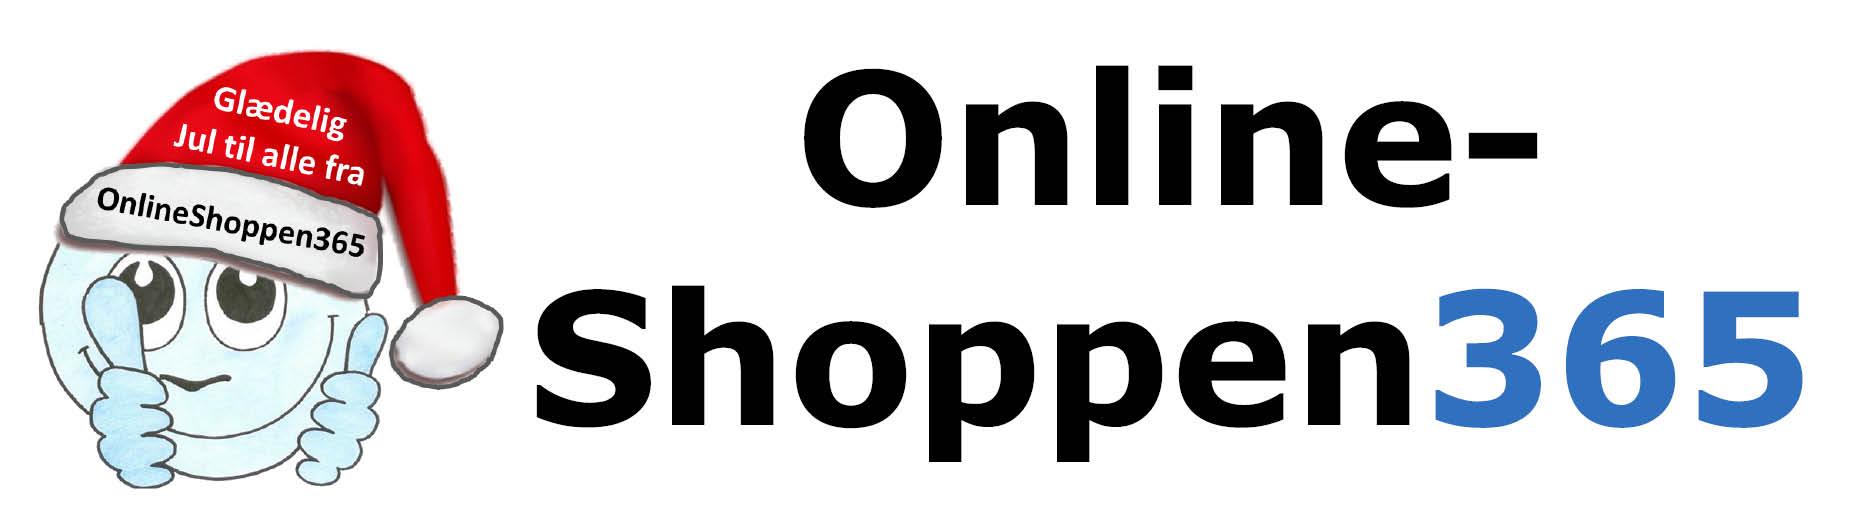 OnlineShoppen365